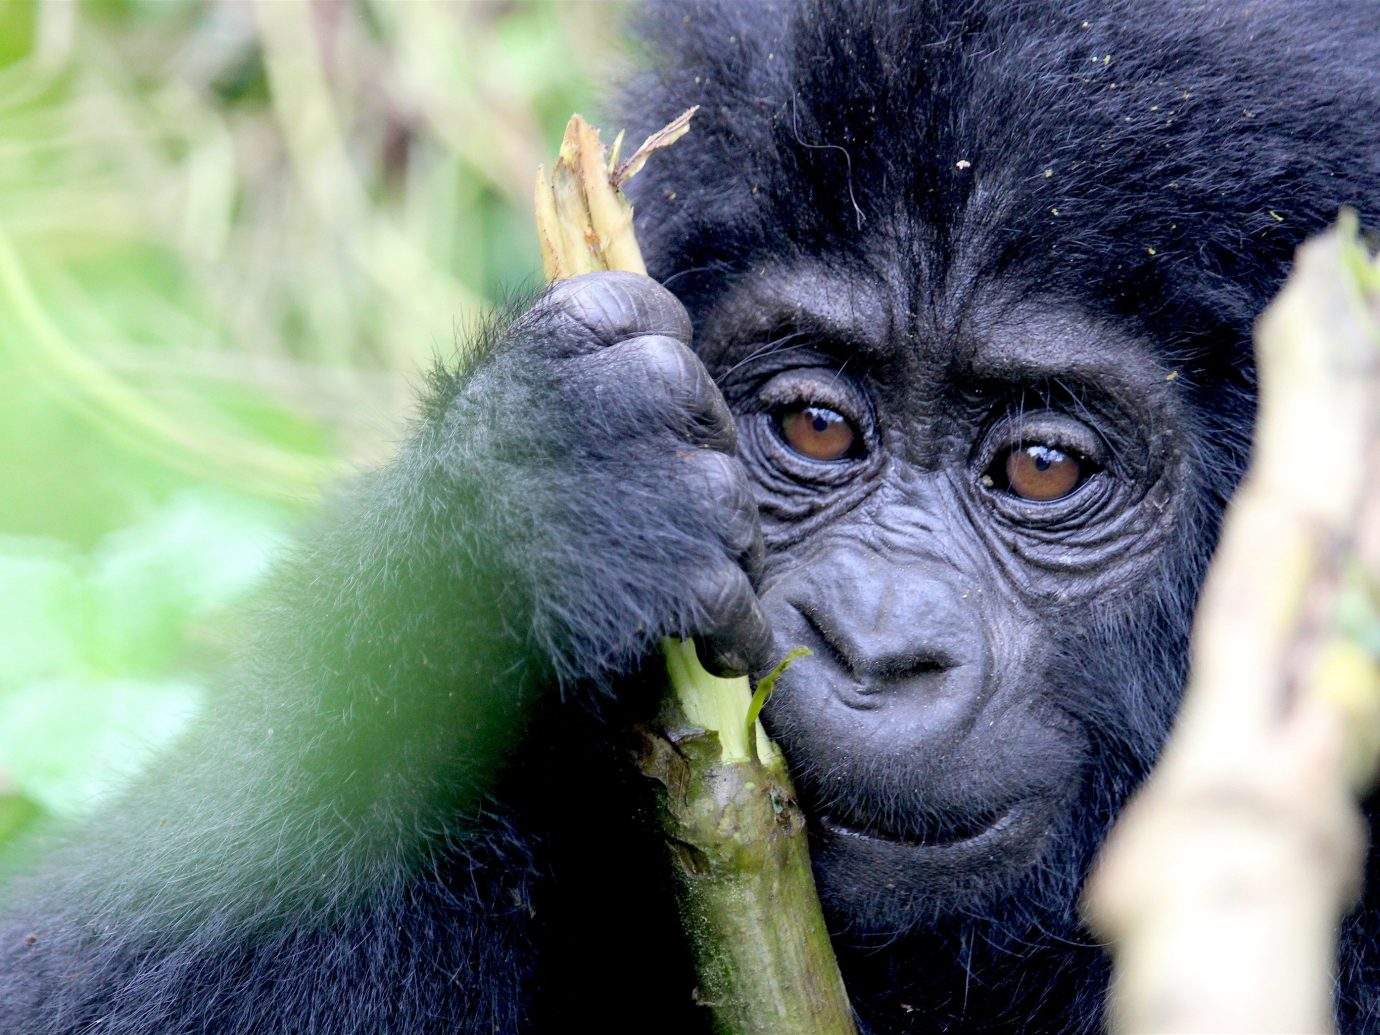 africa Trip Ideas primate animal mammal ape great ape western gorilla black fauna Wildlife organism terrestrial animal common chimpanzee green snout grass chimpanzee plant eyes close